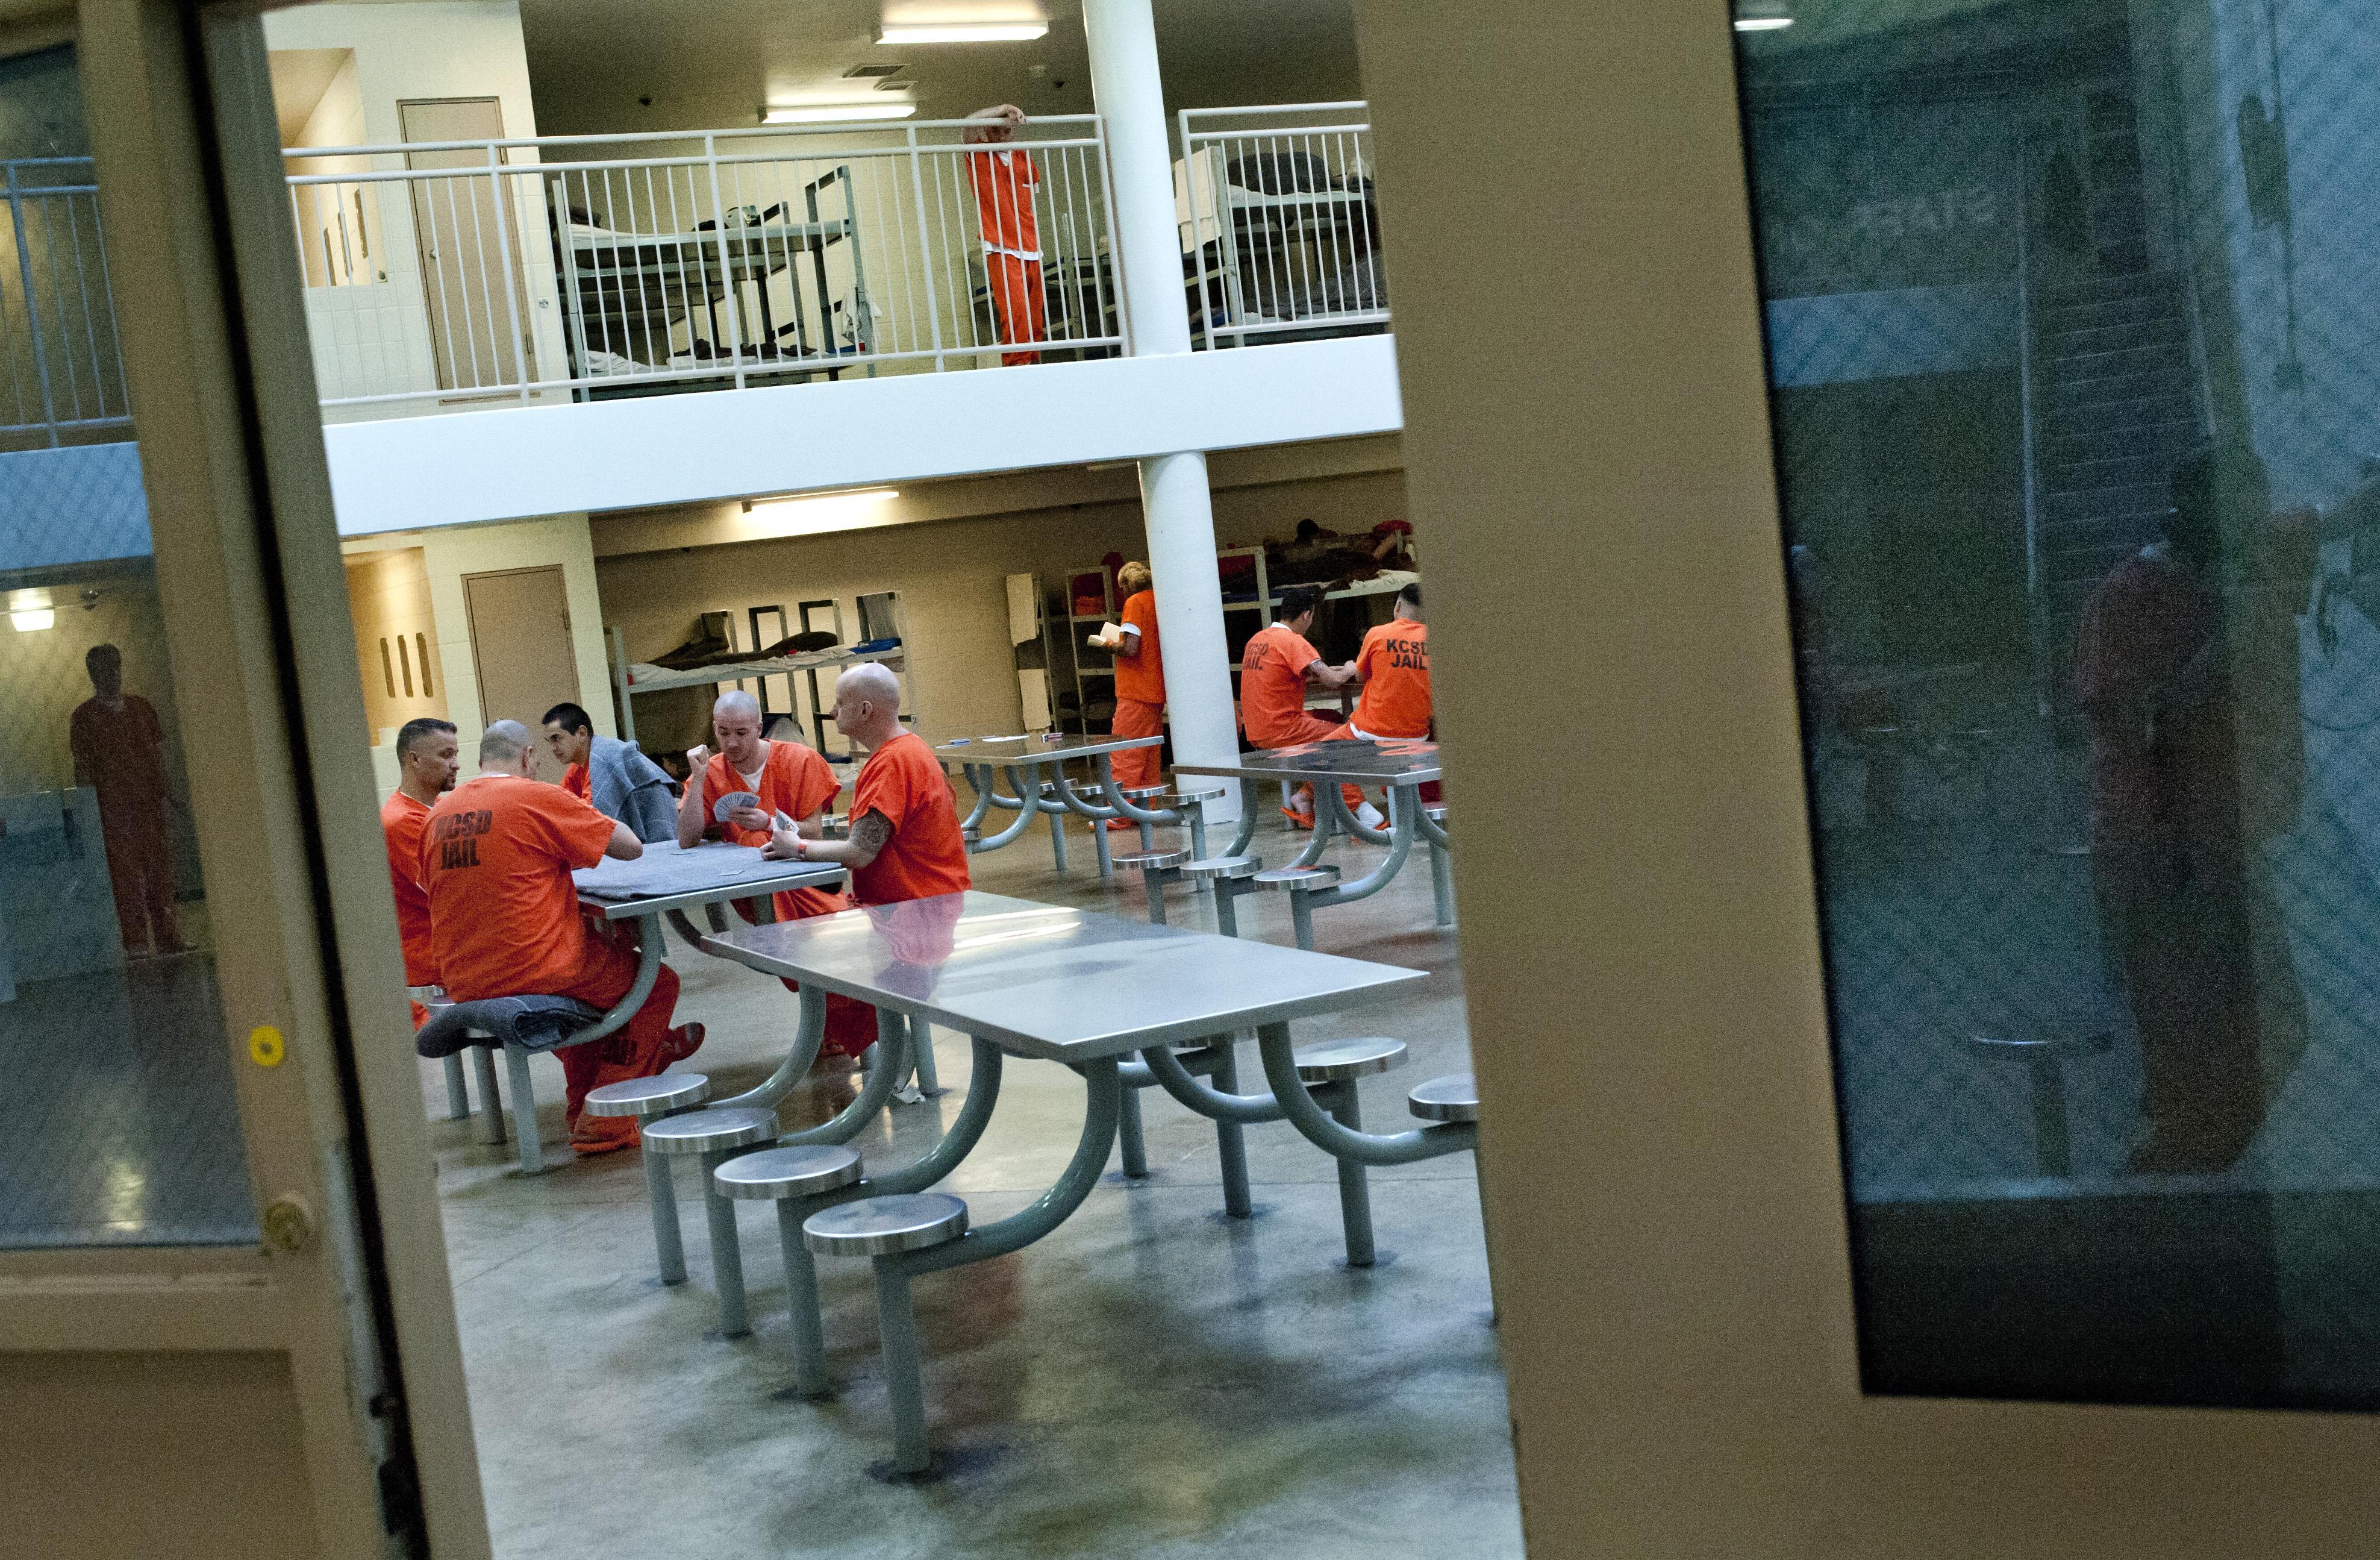 kootenai county prepares for jail expansion as inmate population